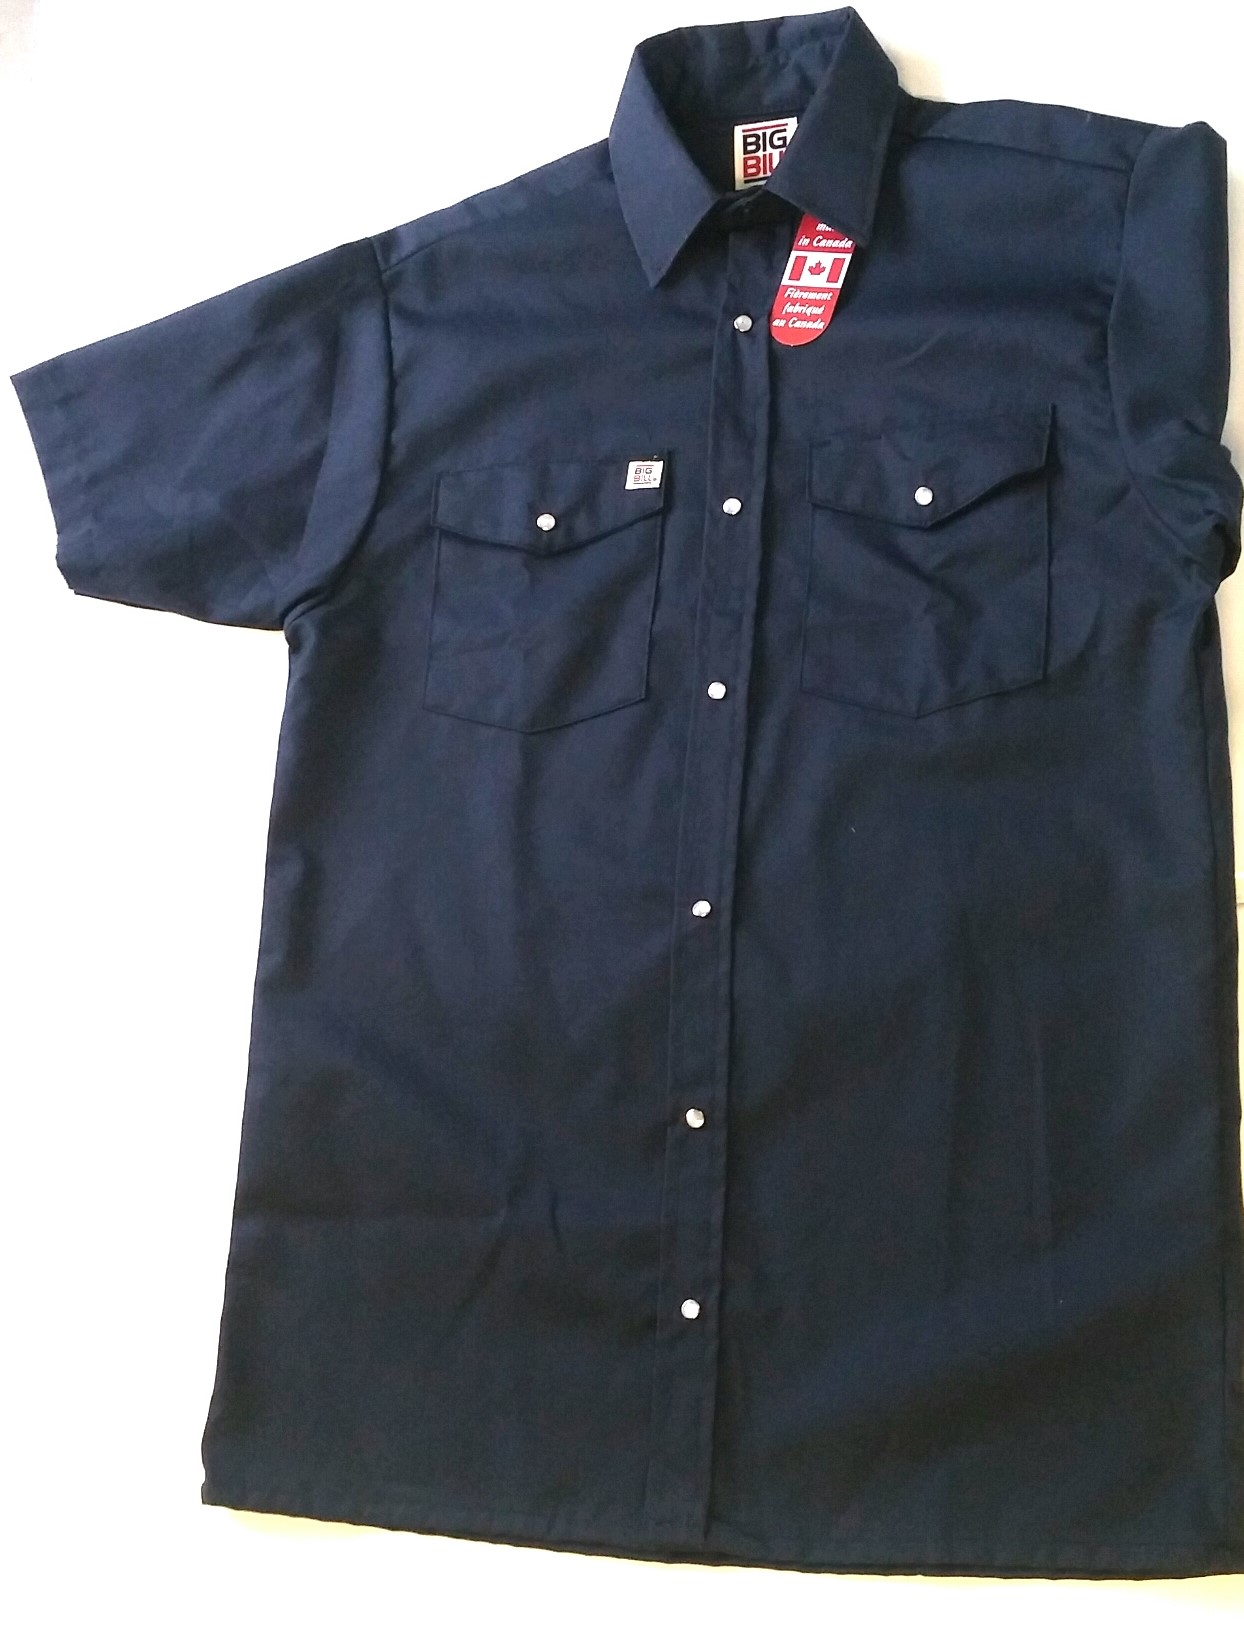 Big bill chemise de travail bouton pression manche courte (237)